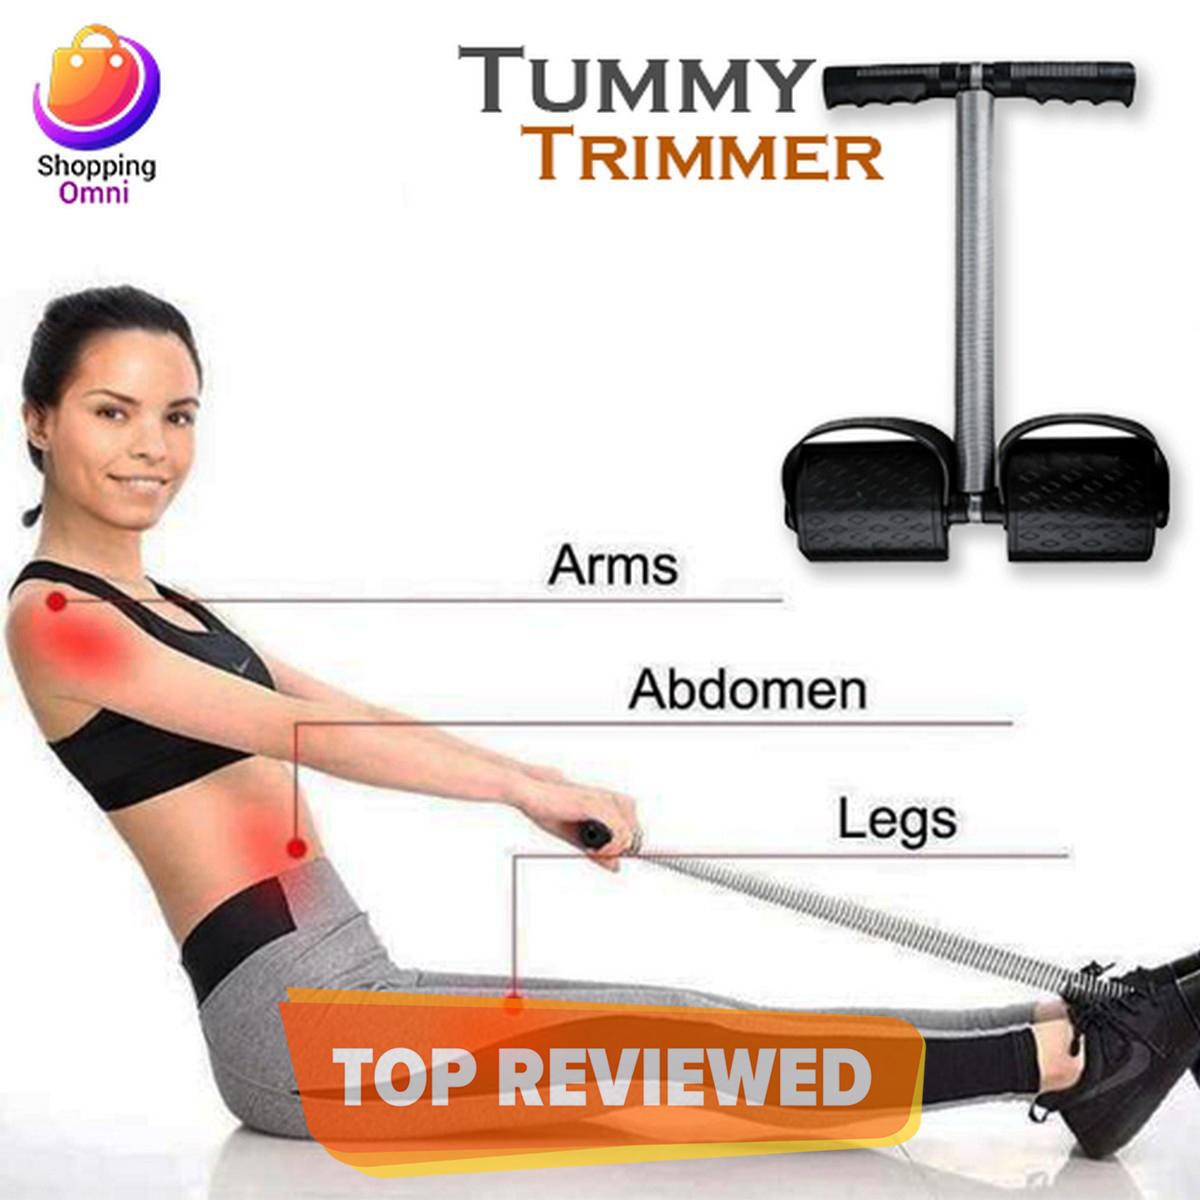 Home Gym Equipments Online in Pakistan - Daraz.pk